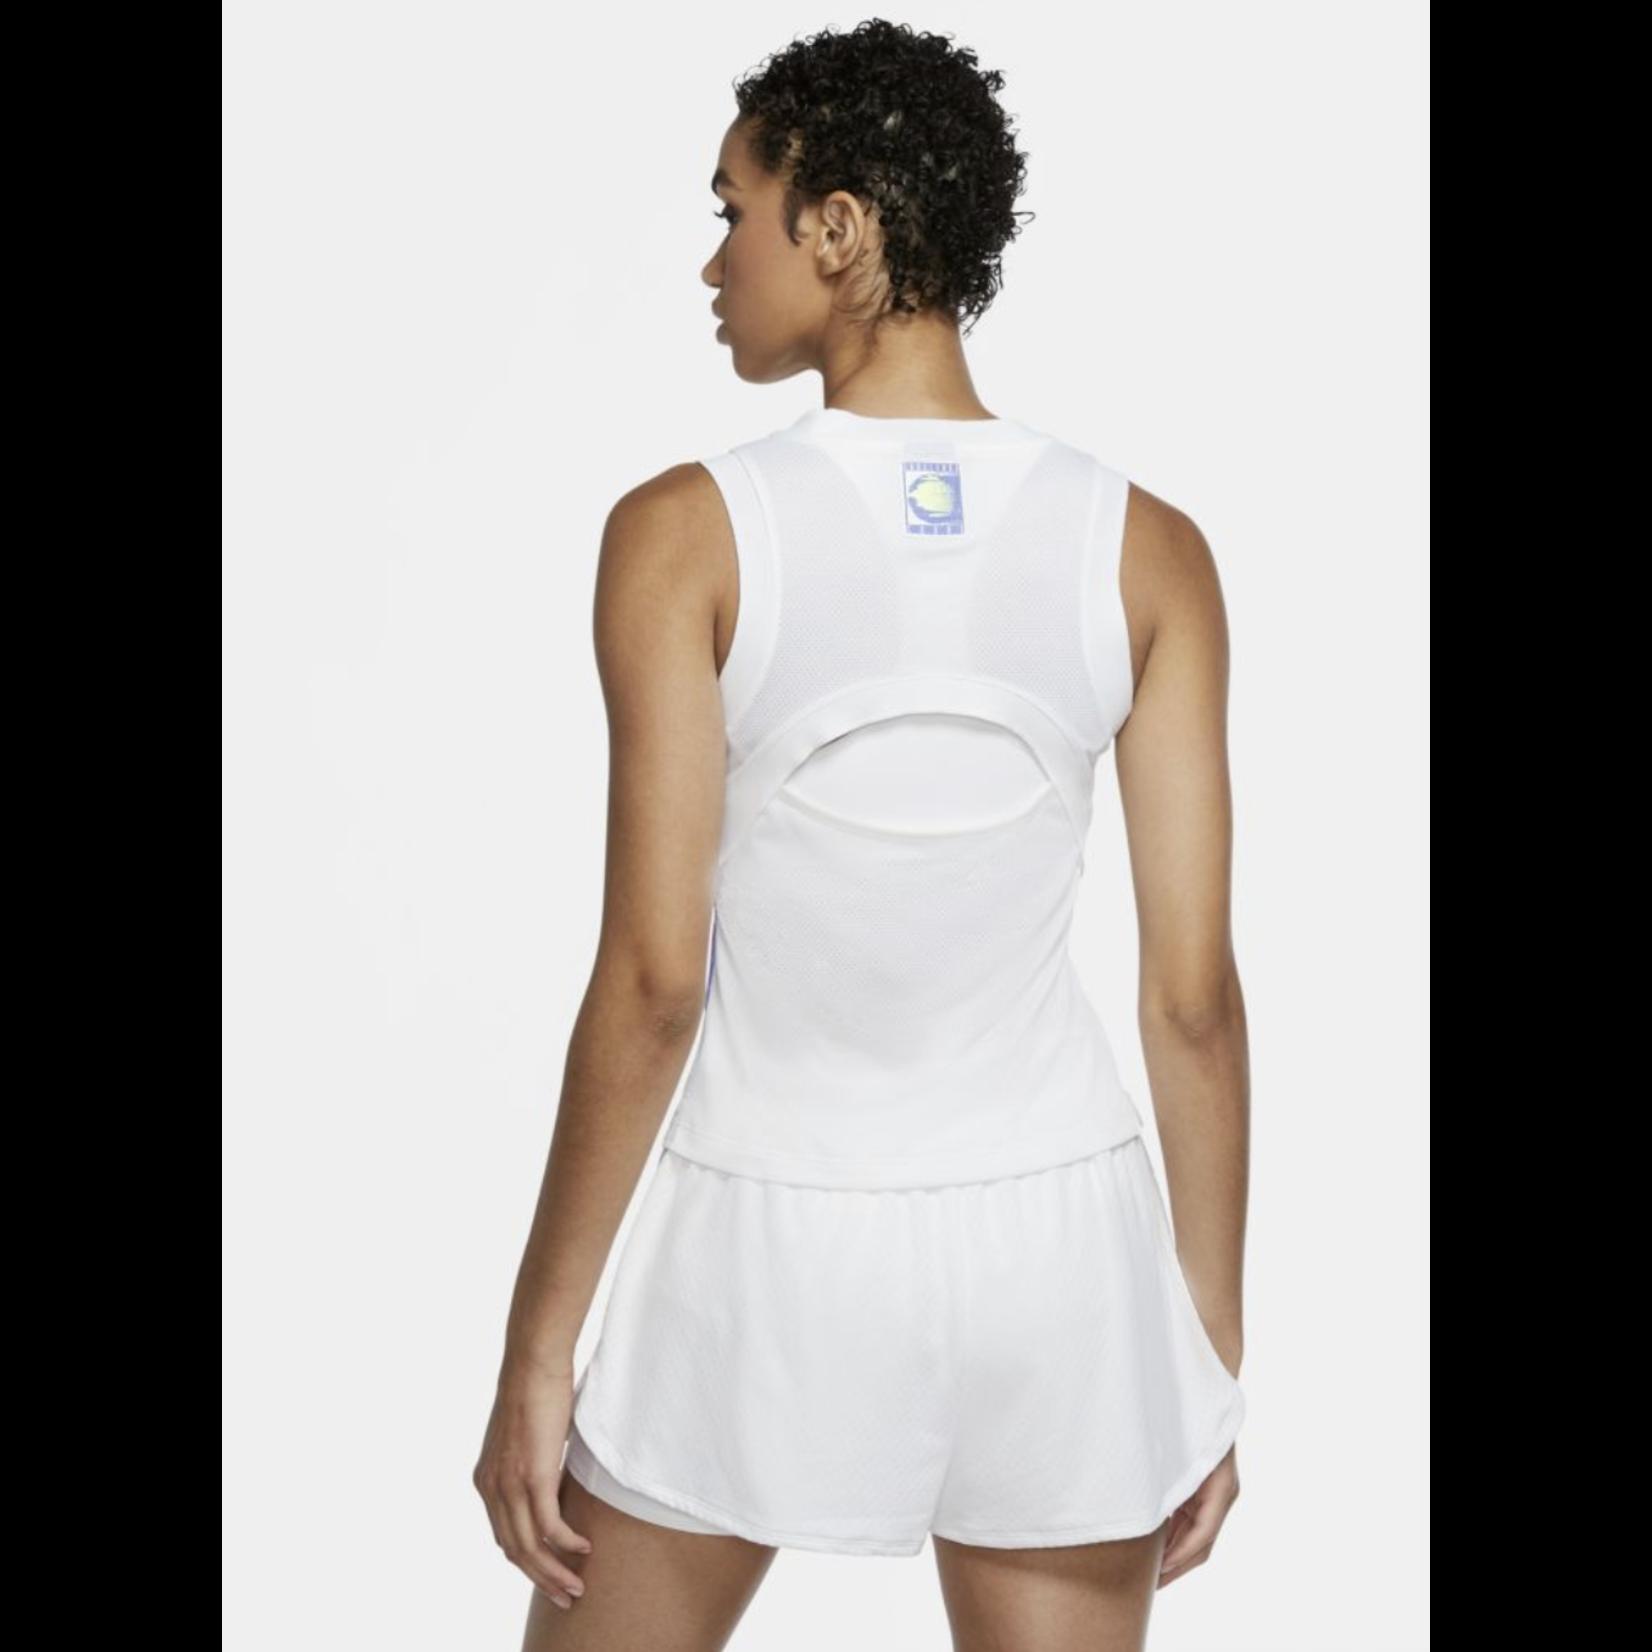 Nike NikeCourt Slam Tank Top